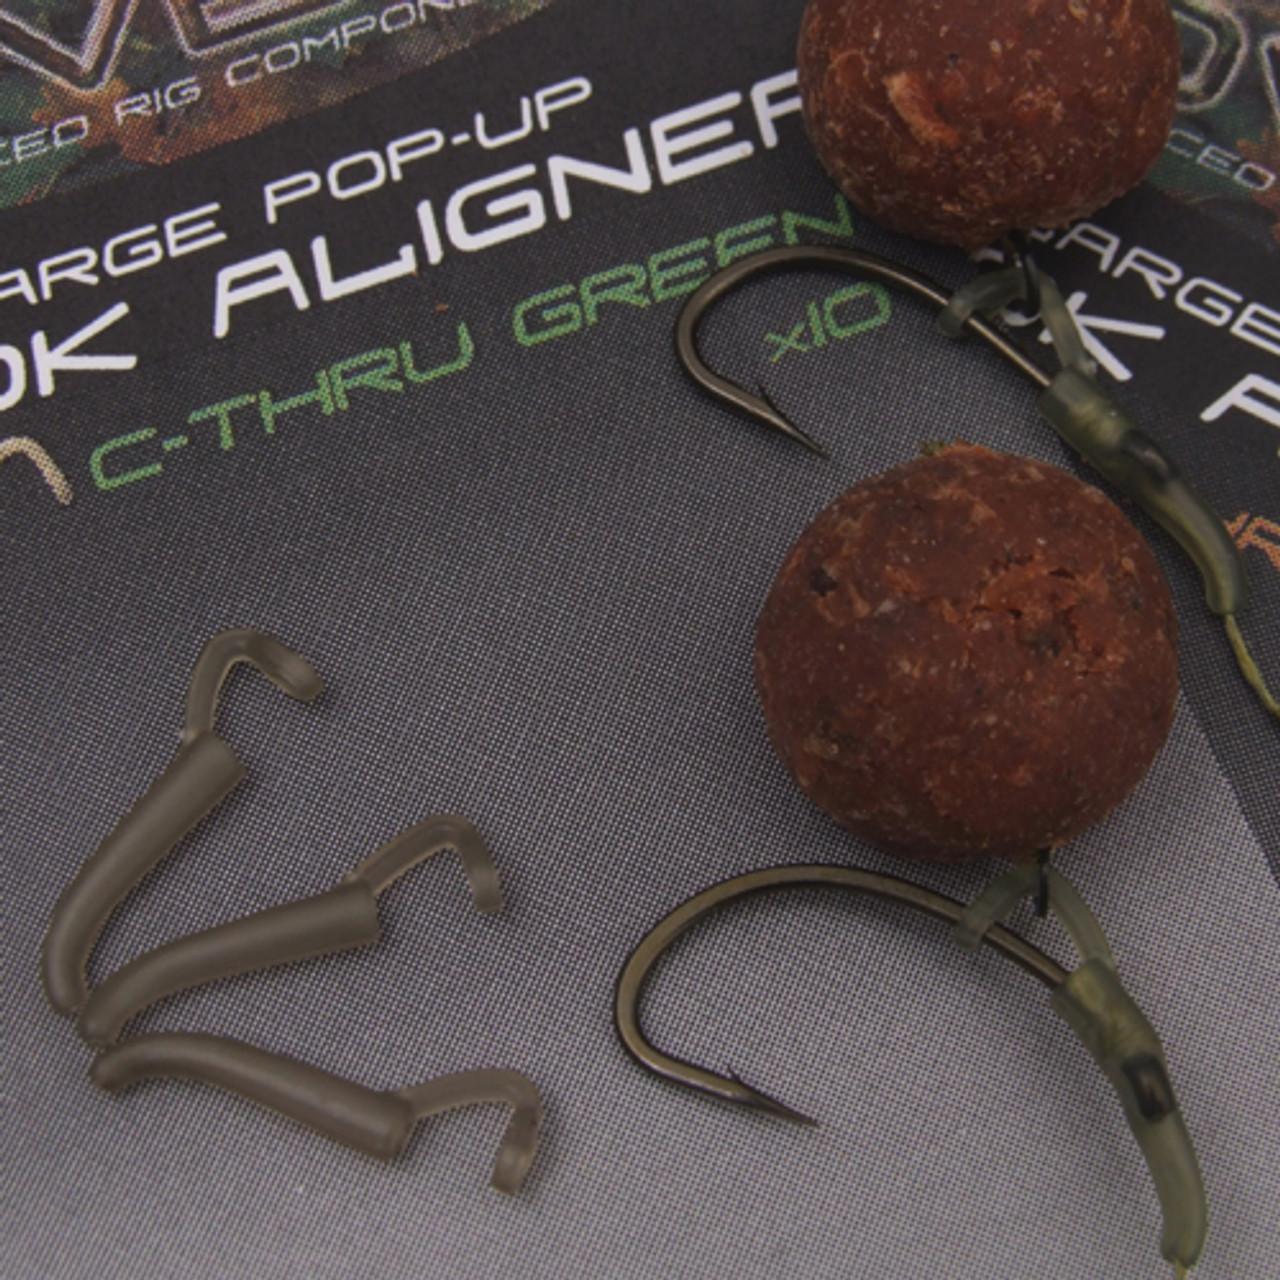 Gardner Covert Pop Up Hook Aligners - Green